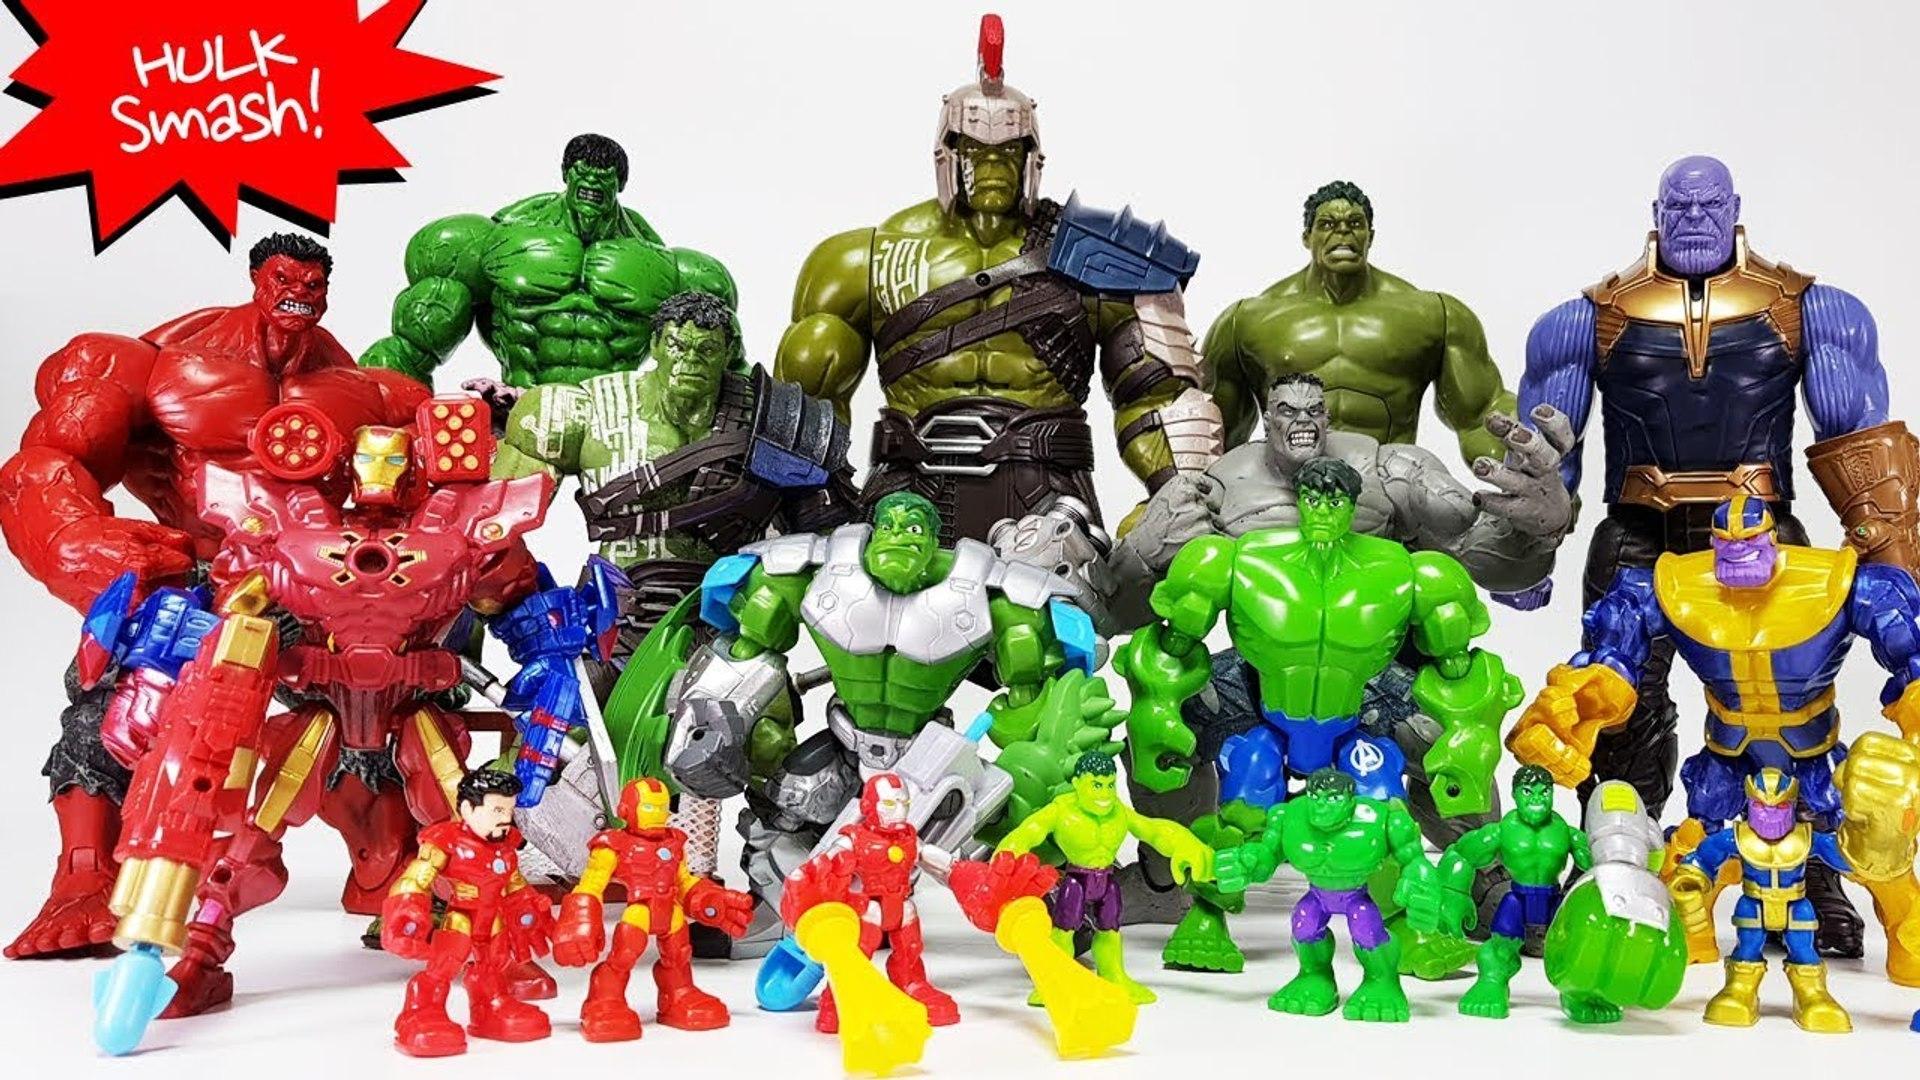 Go Avengers Power-up Hulk, Iron man~- Infinity War Thanos Gauntlet Battle  Toys Play